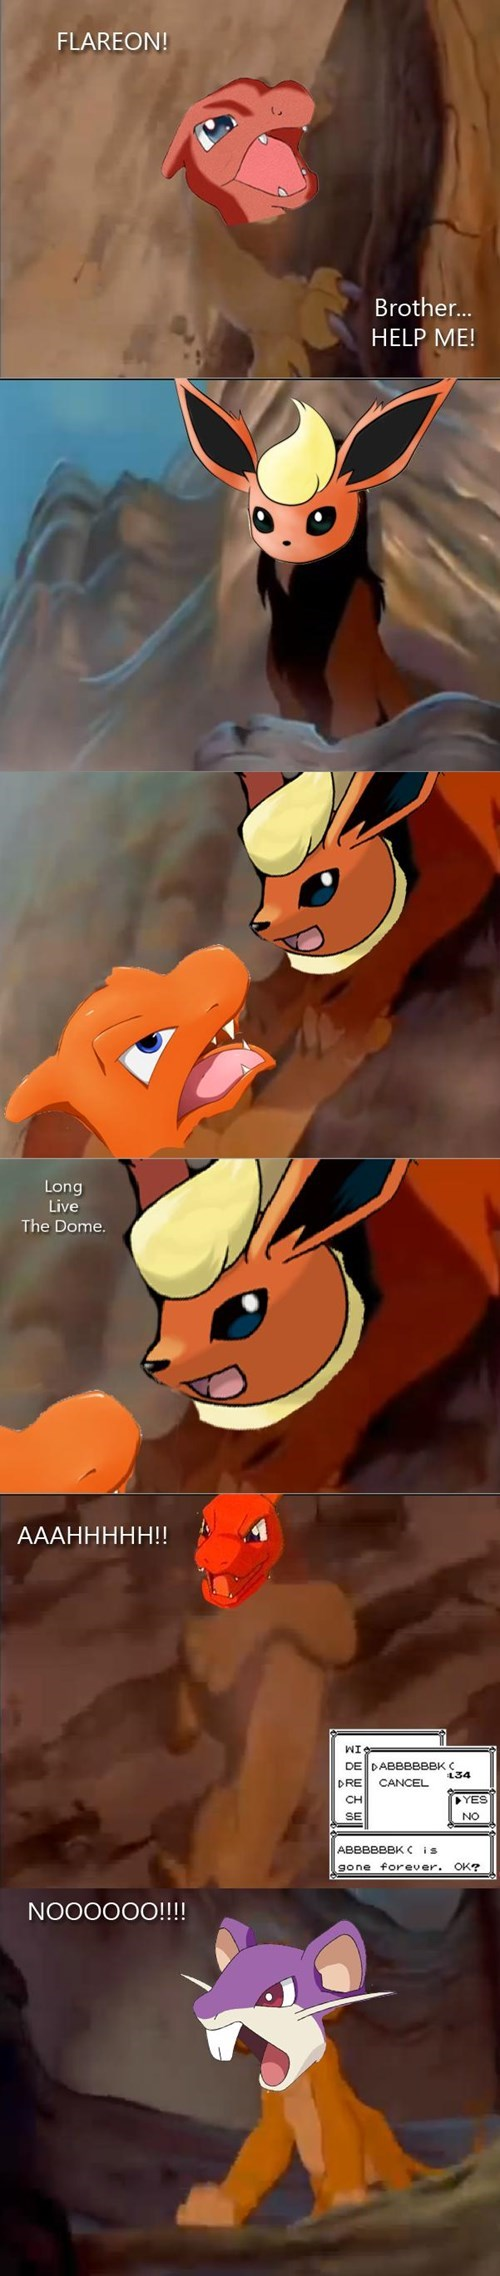 the lion king Pokémon twitch plays pokemon - 8070199040